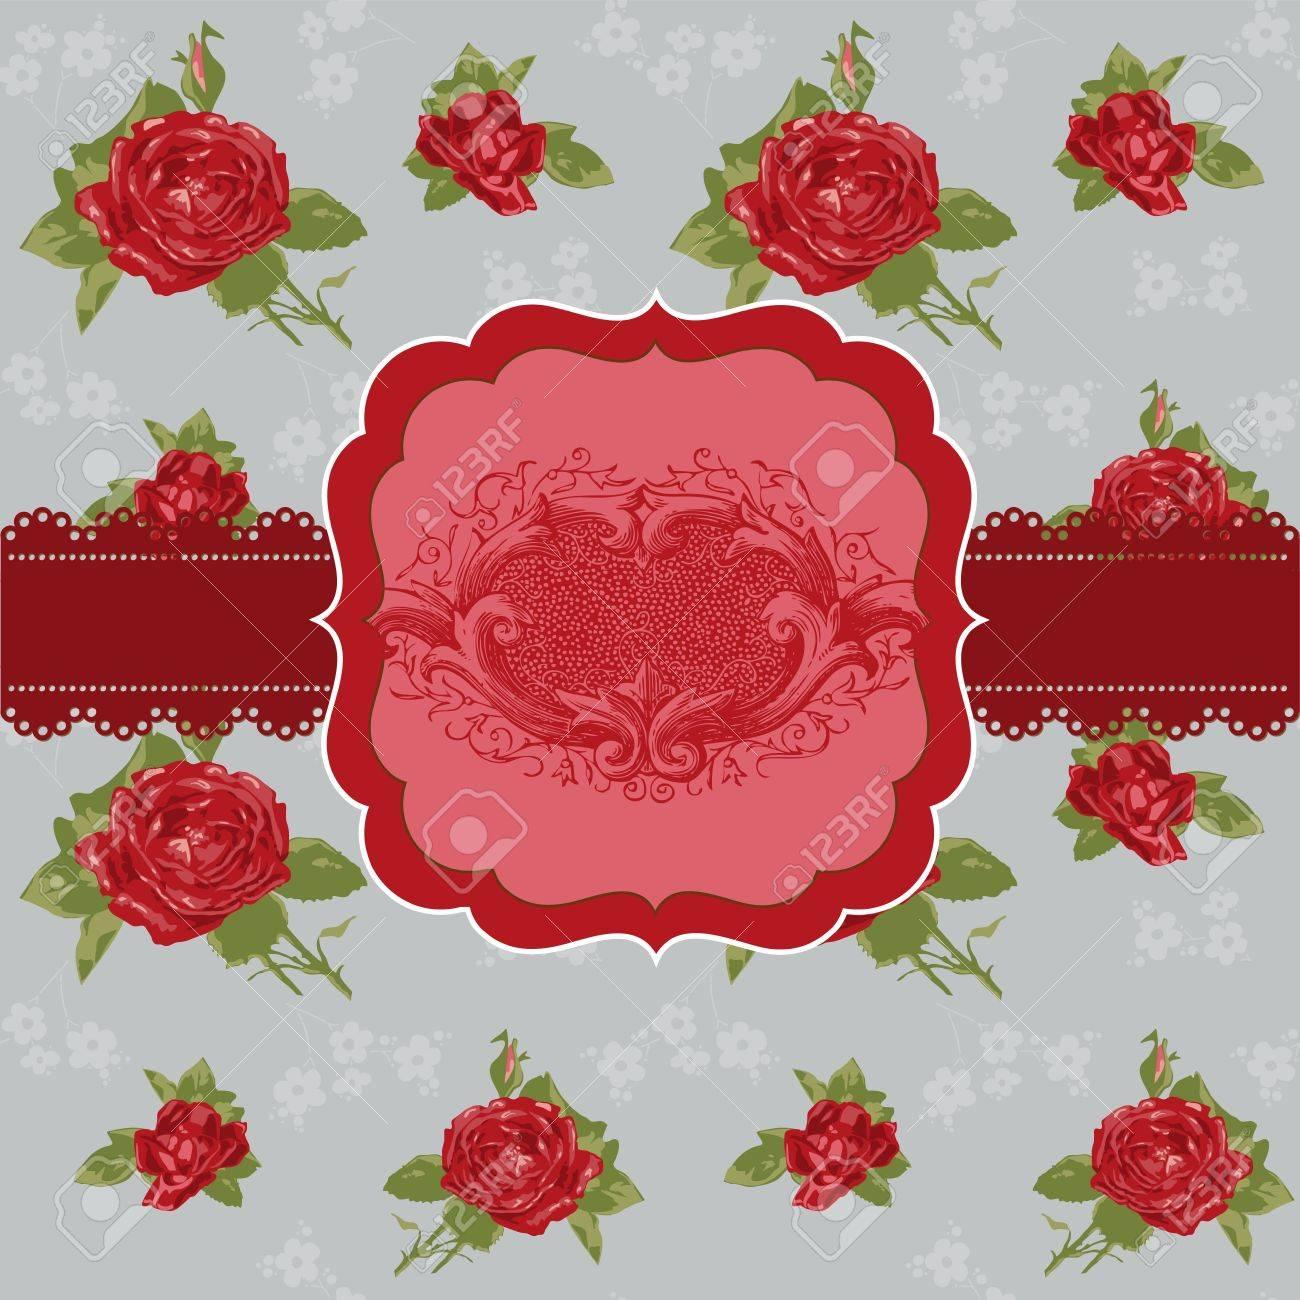 Vintage Flower Card - for invitation, congratulation, wedding in vector Stock Vector - 11480509